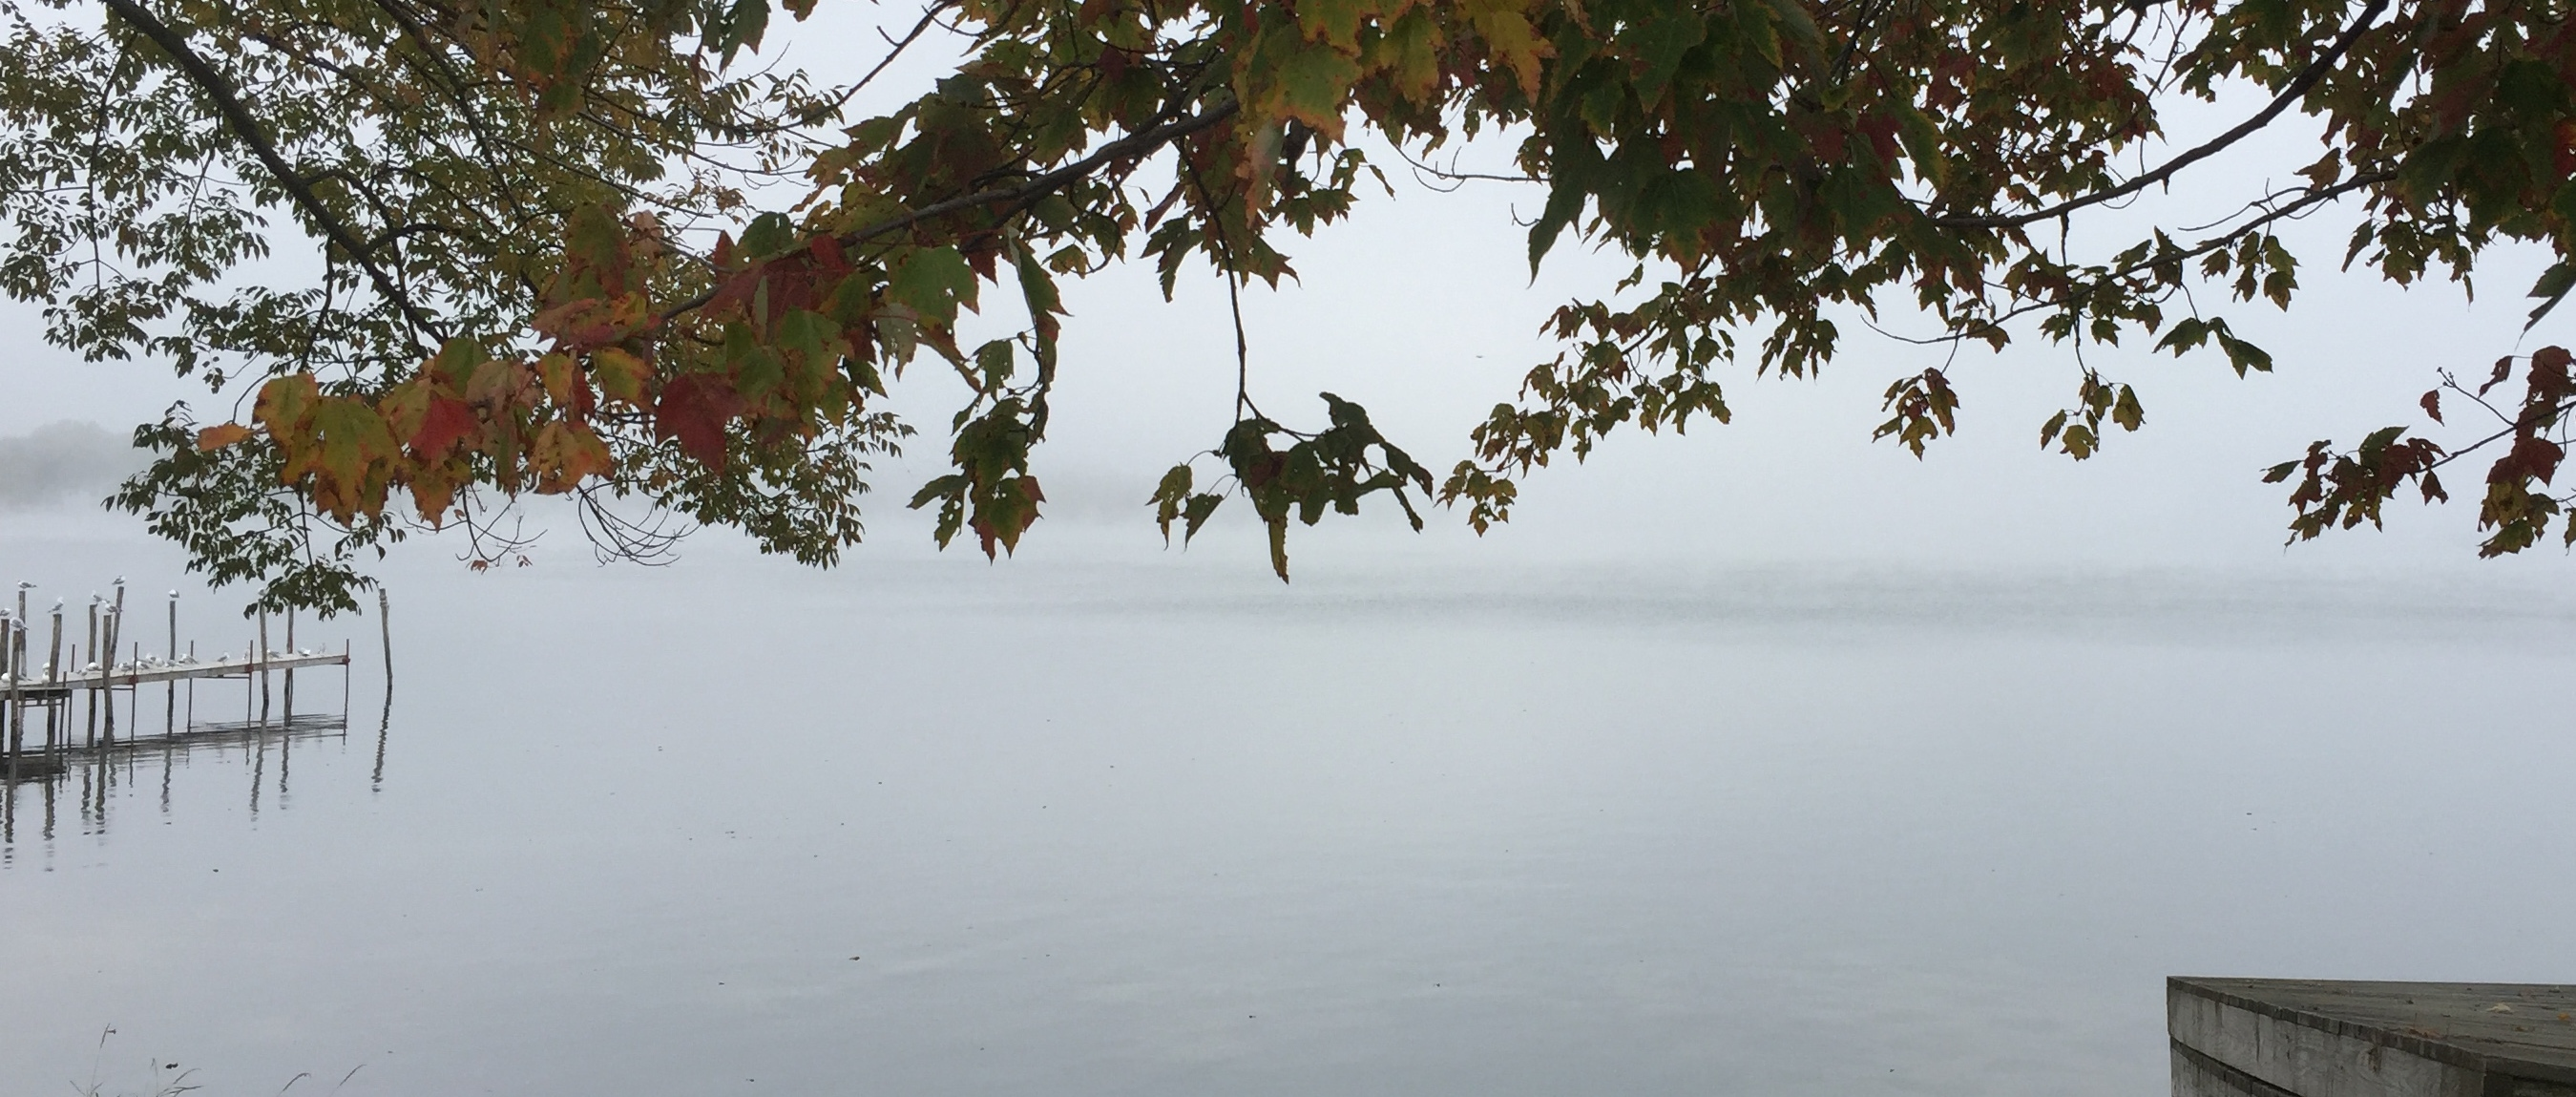 Chautuaqua lake mist